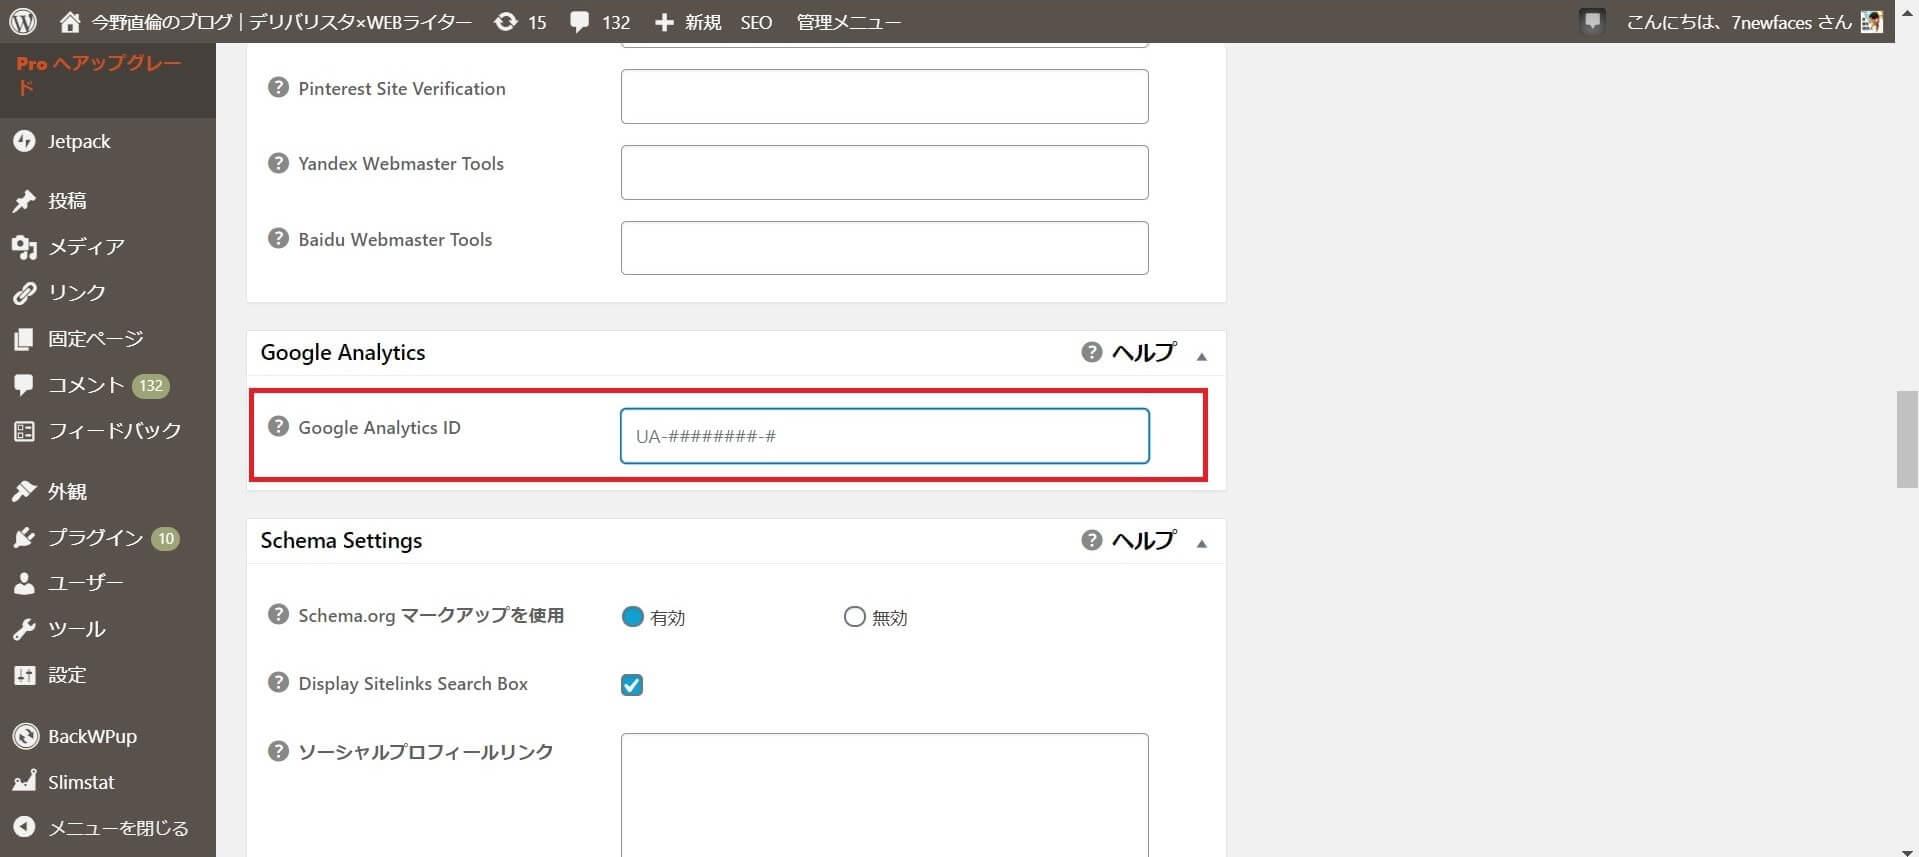 WordPressのall in one seo packプラグイン